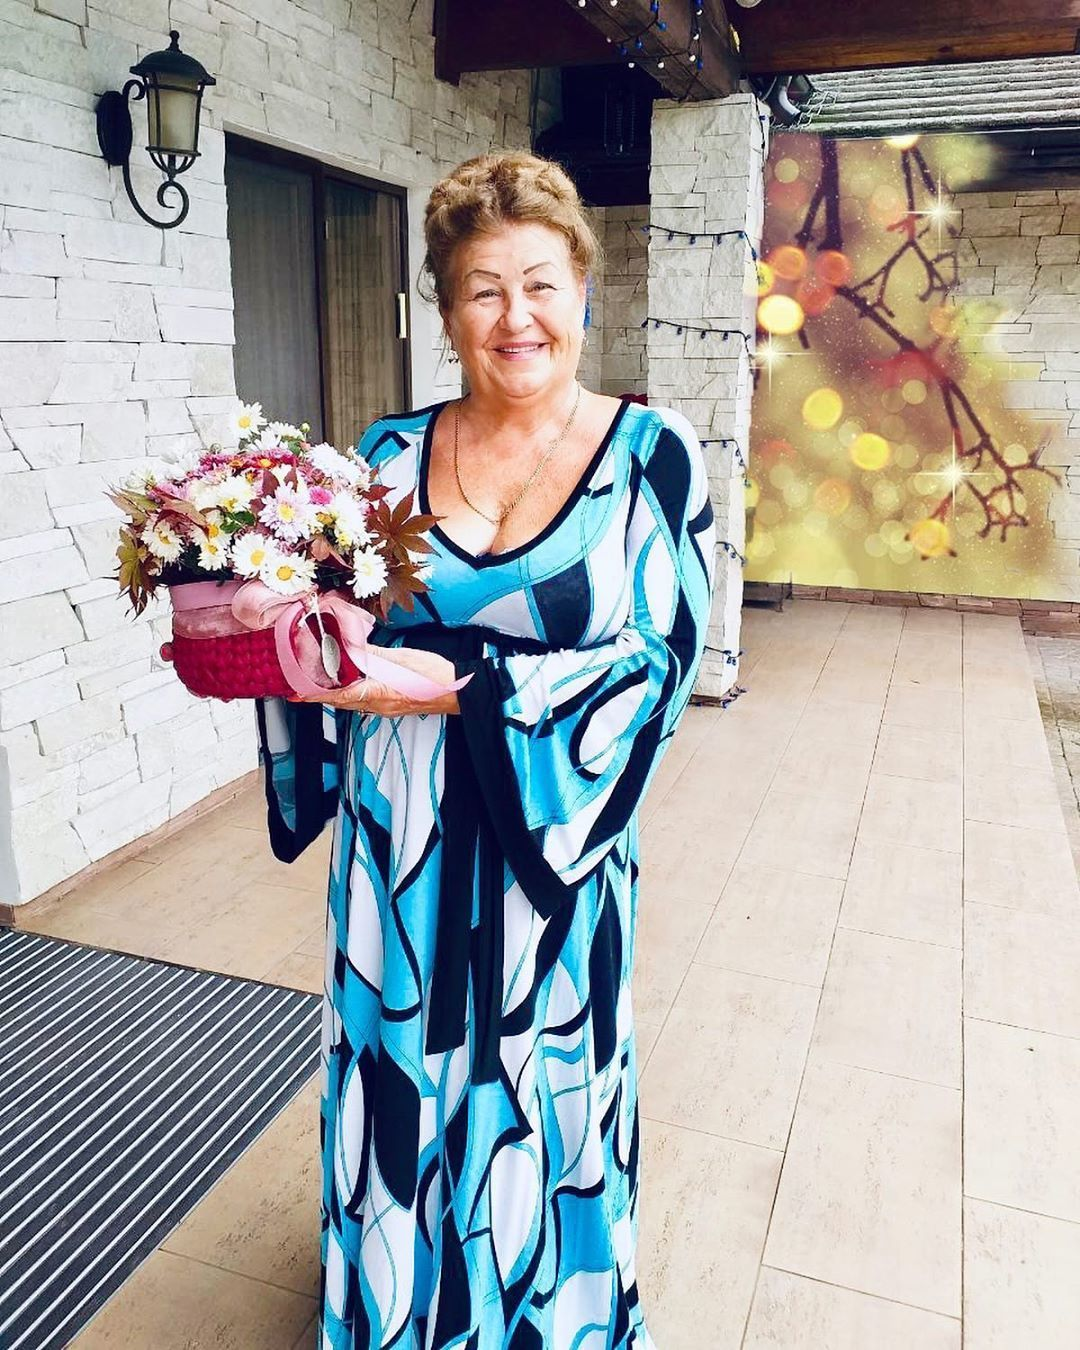 Ірина Білик, матір